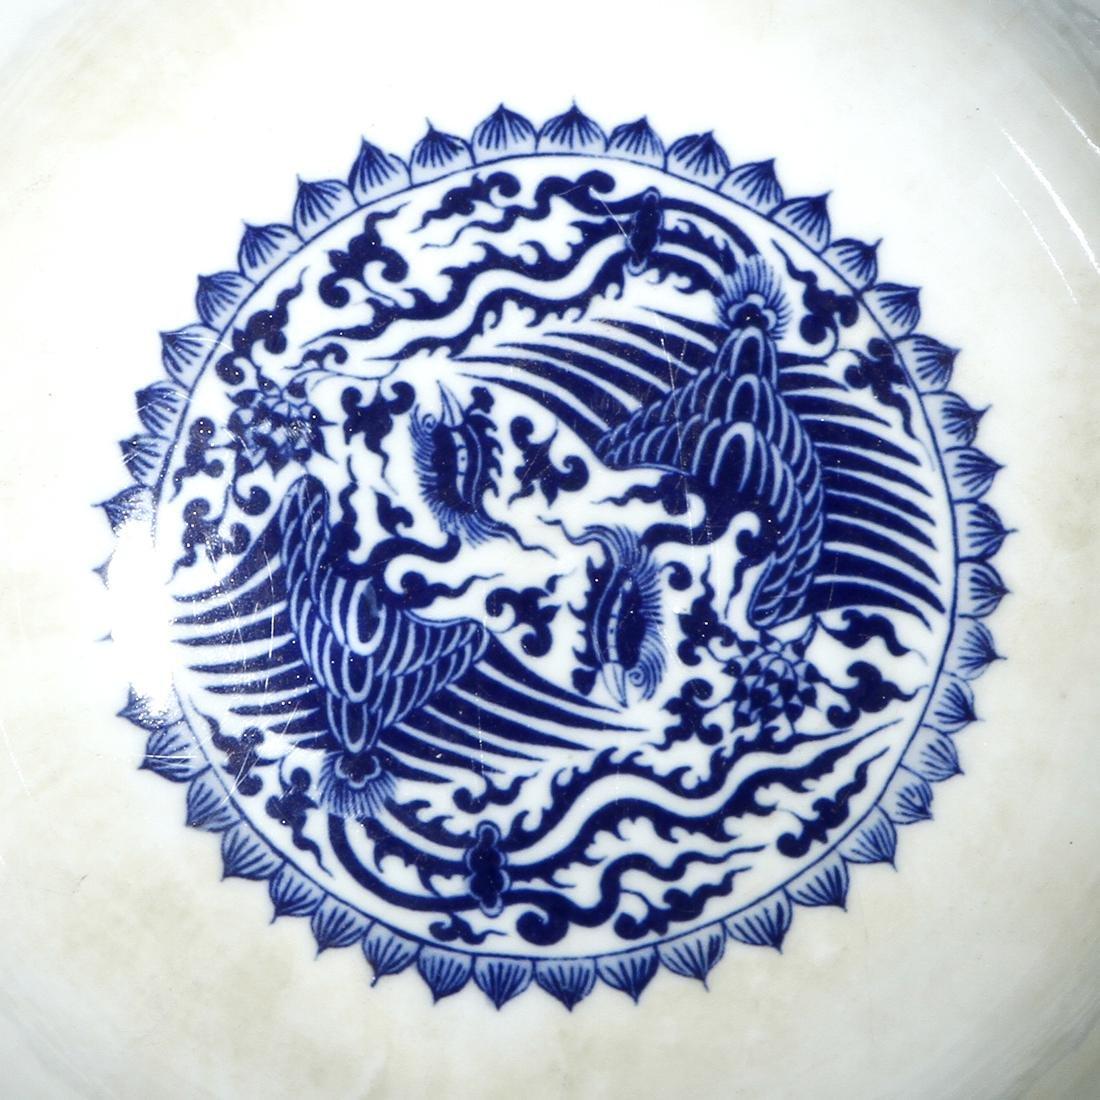 Chinese Blue and White 'Phoenix Medallion' Bowl - 3